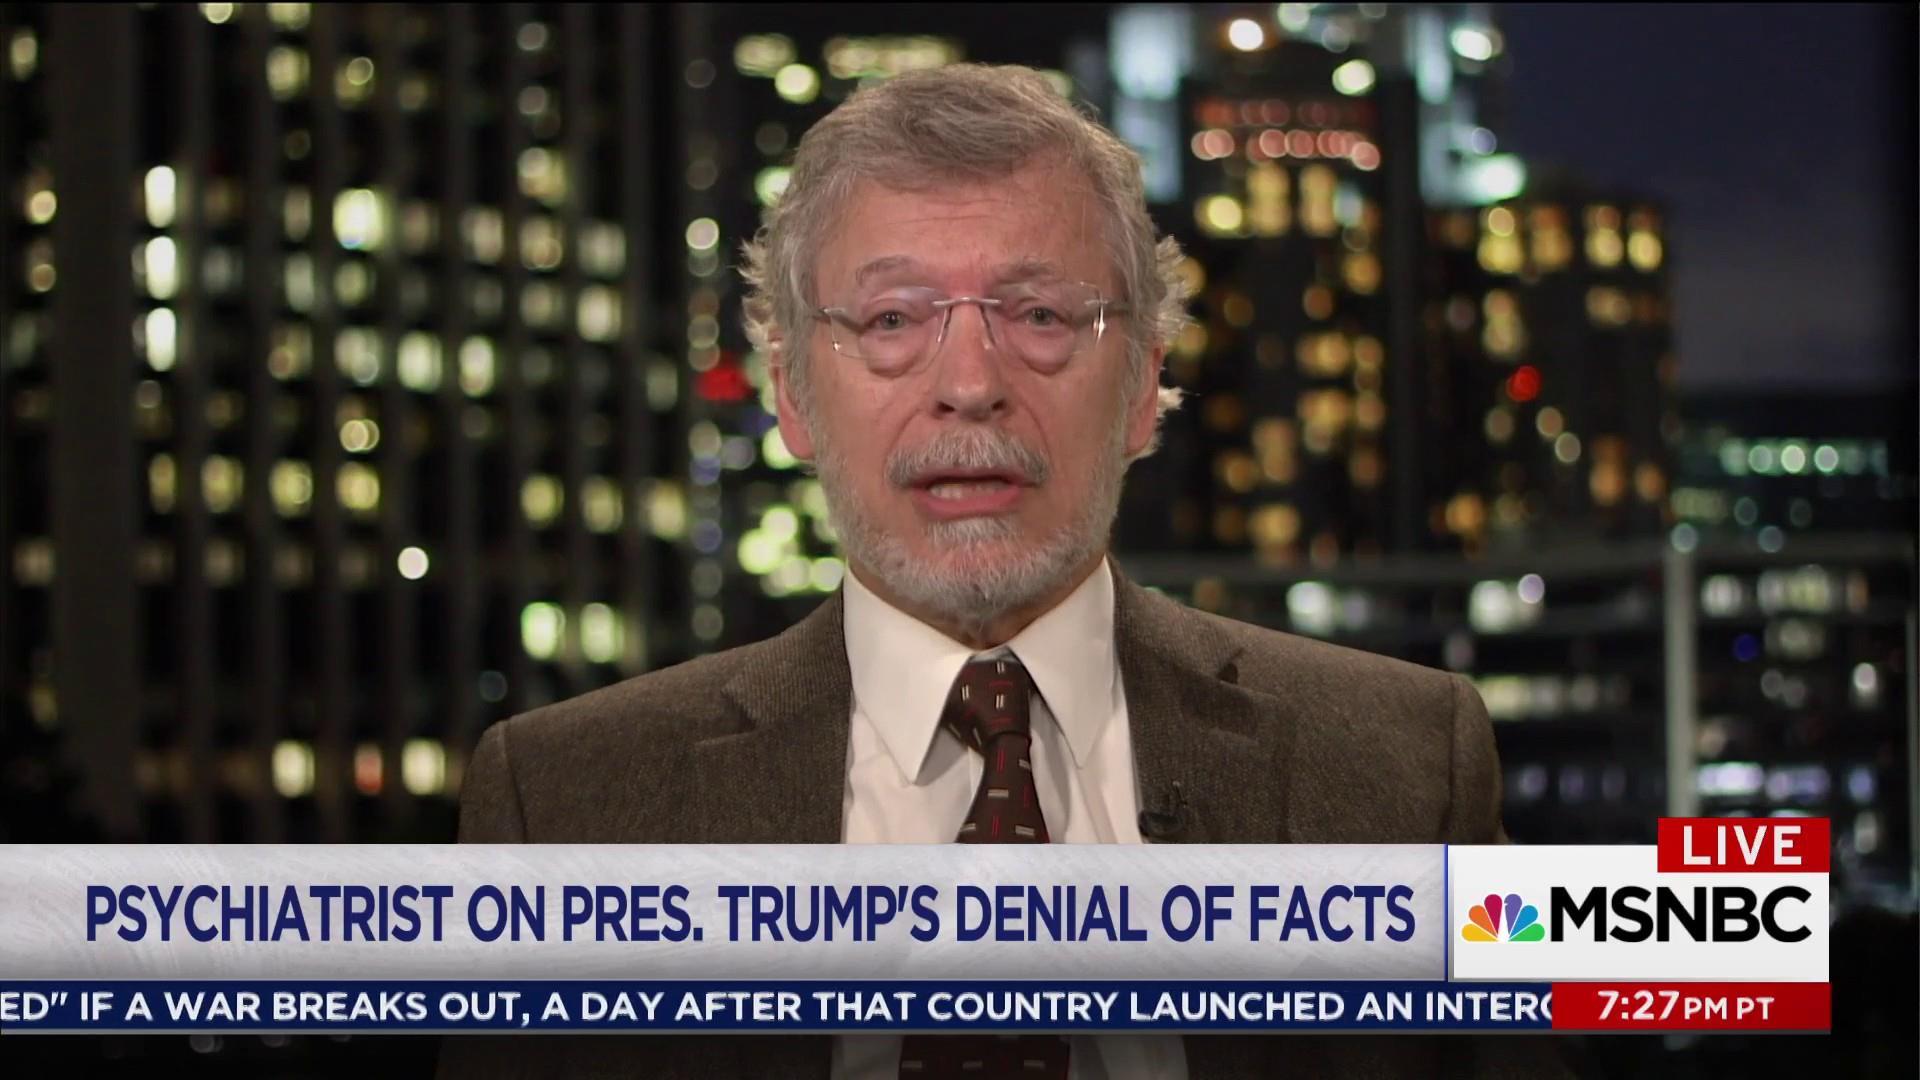 Psychiatrist: Trump's mental state an 'enormous present danger'